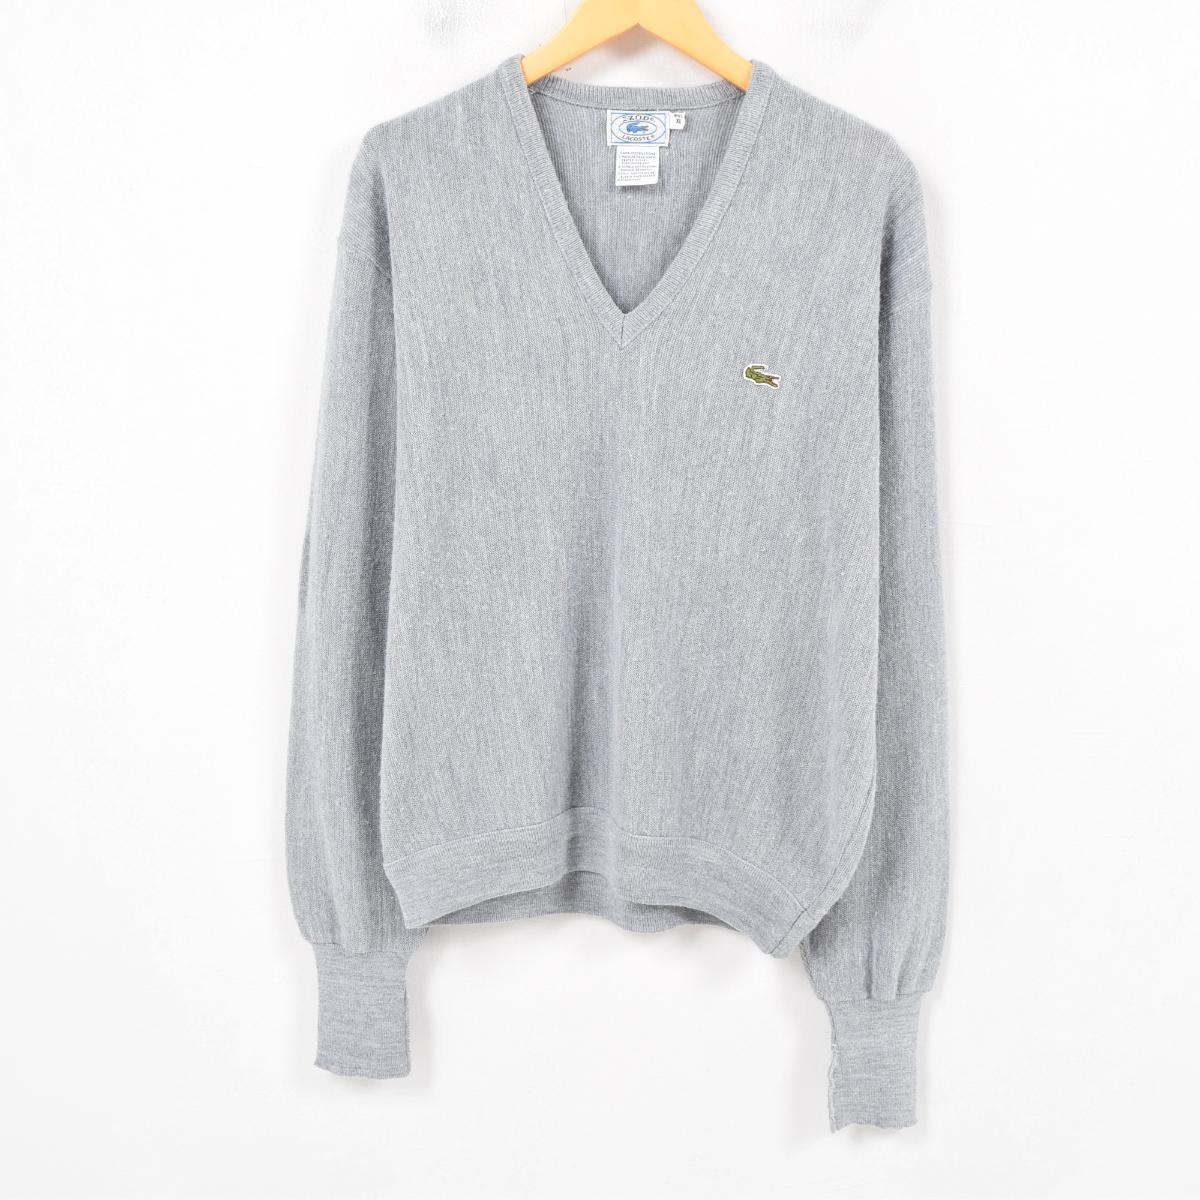 cab977686614a 70-80 generation Lacoste LACOSTE IZOD V neck acrylic knit sweater men XL  vintage  wap8109